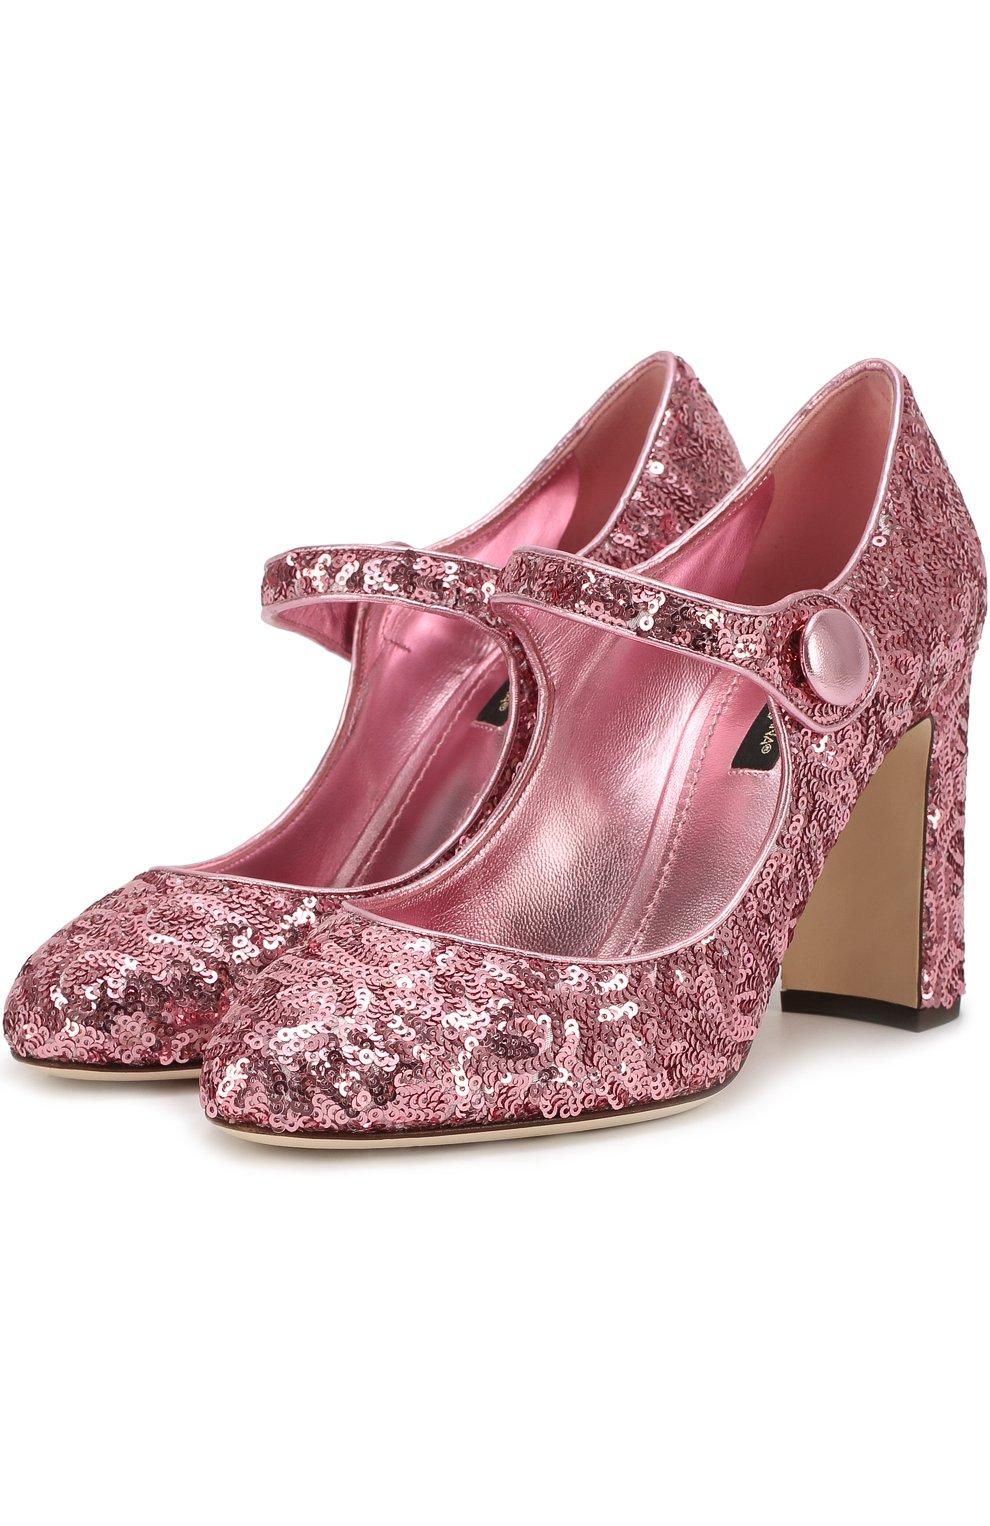 Туфли Vally с пайетками | Фото №1